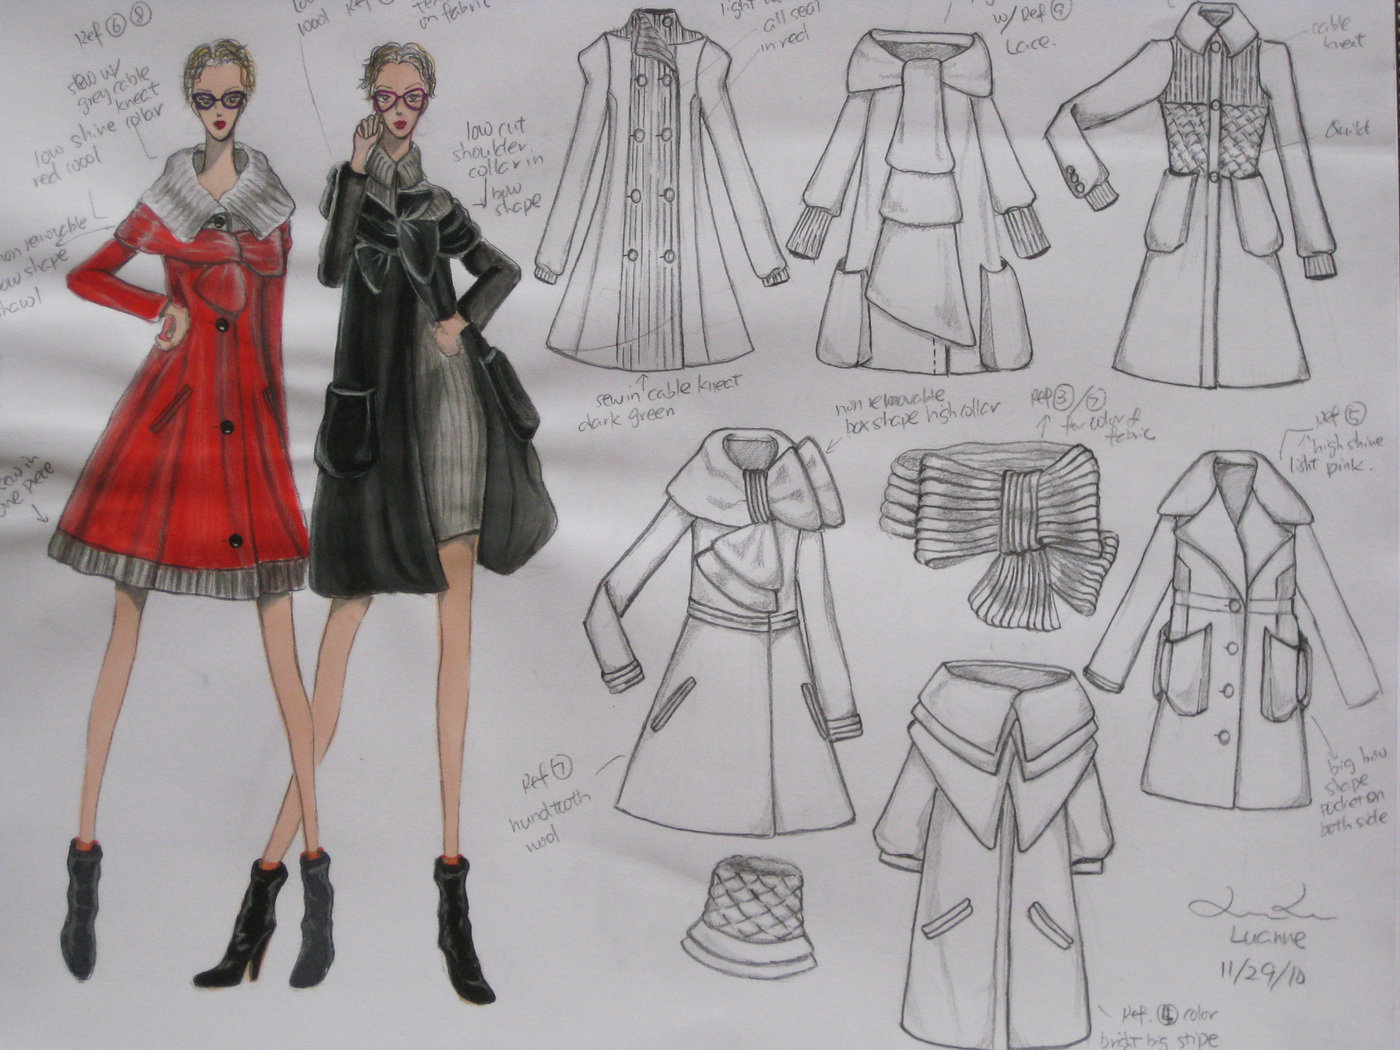 Fashion Illustration Pencil Sketches By Luanne Lu At Coroflot Com